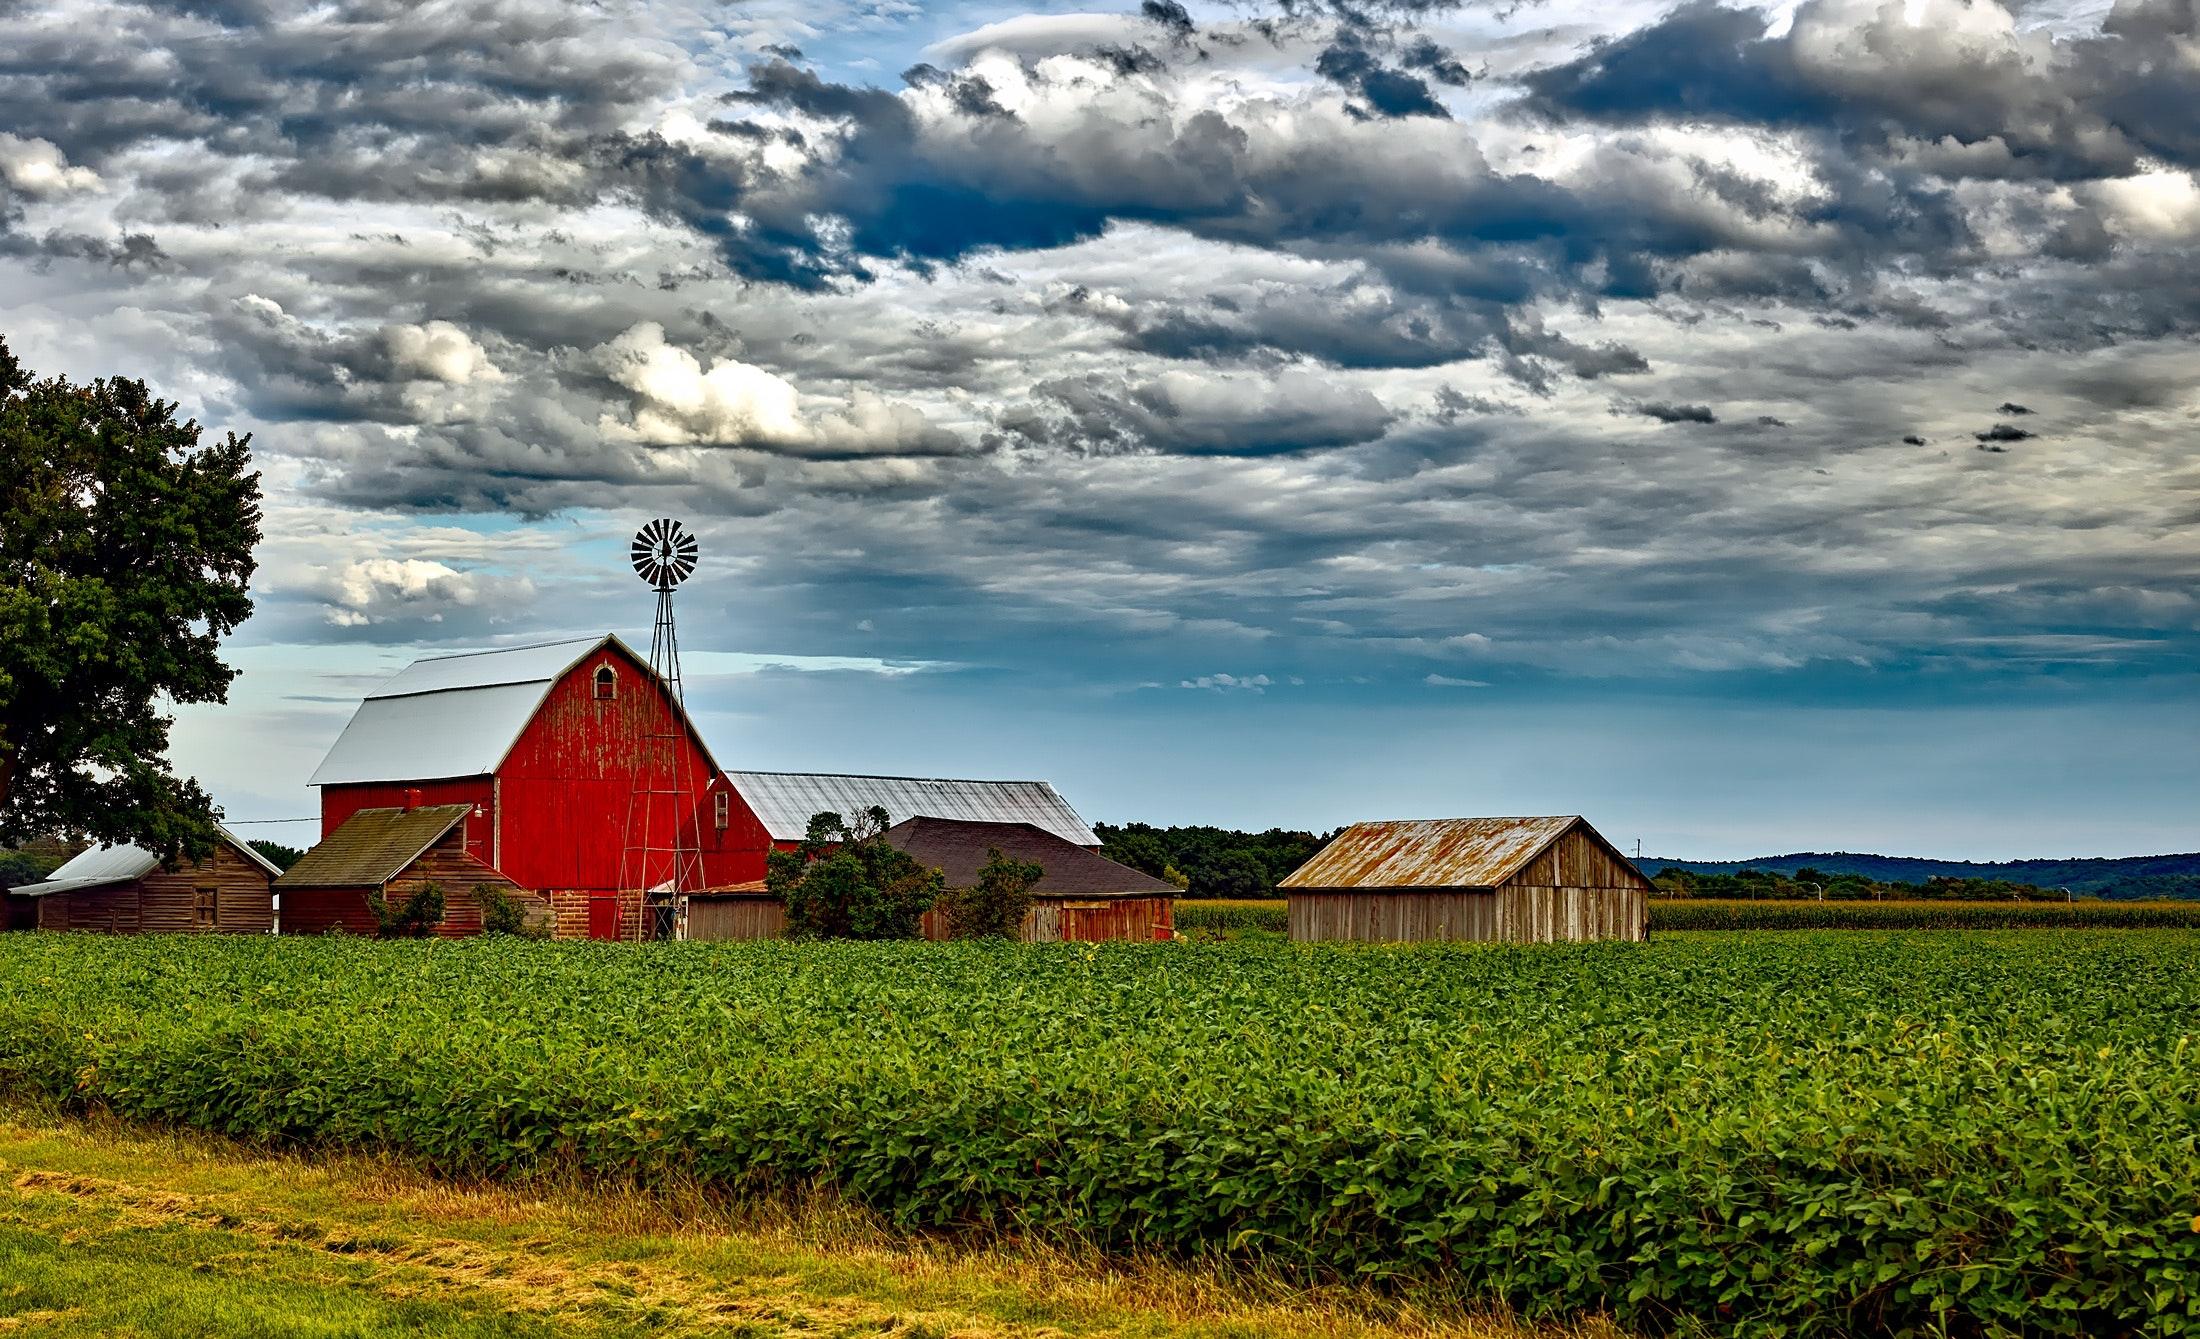 agriculture-barn-buildings-248880.jpg